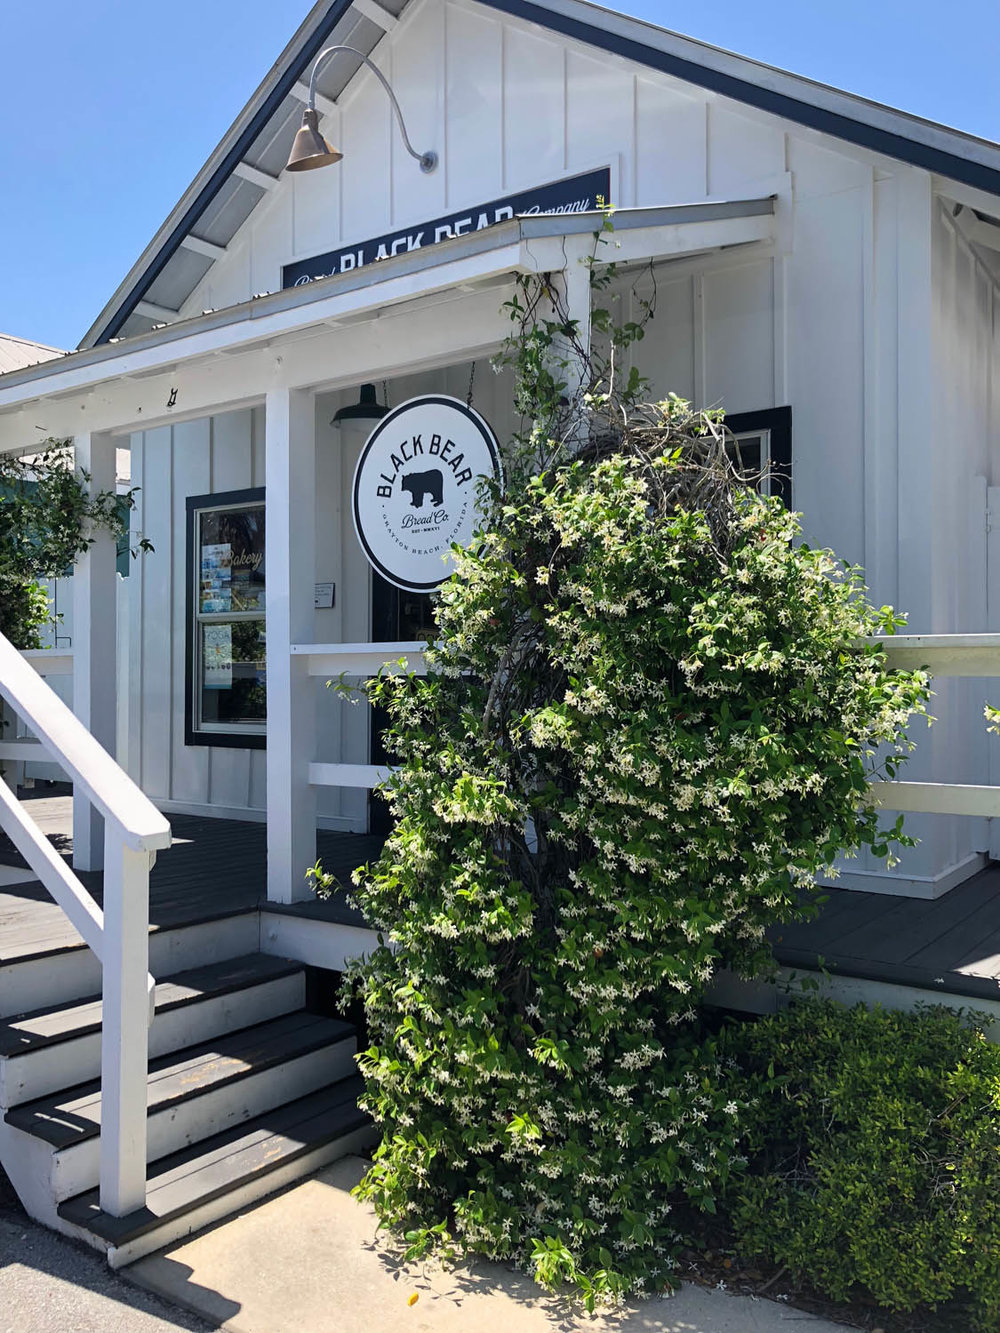 Black Bear Bread Company coffee shop in Grayton Beach, Florida